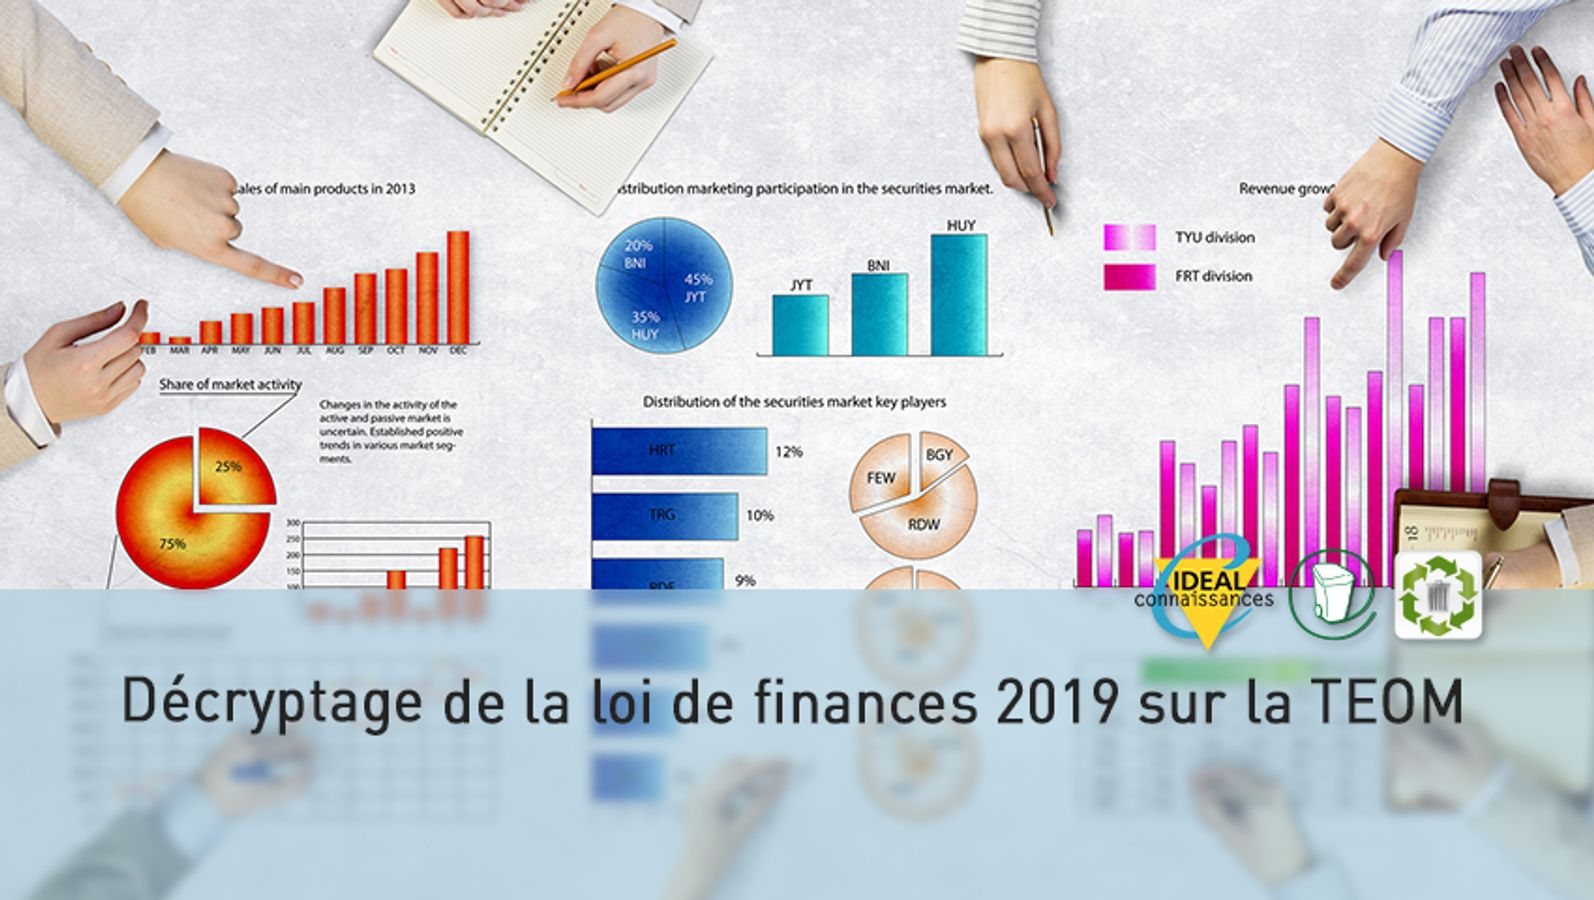 Décryptage de la loi de finances 2019 sur la TEOM